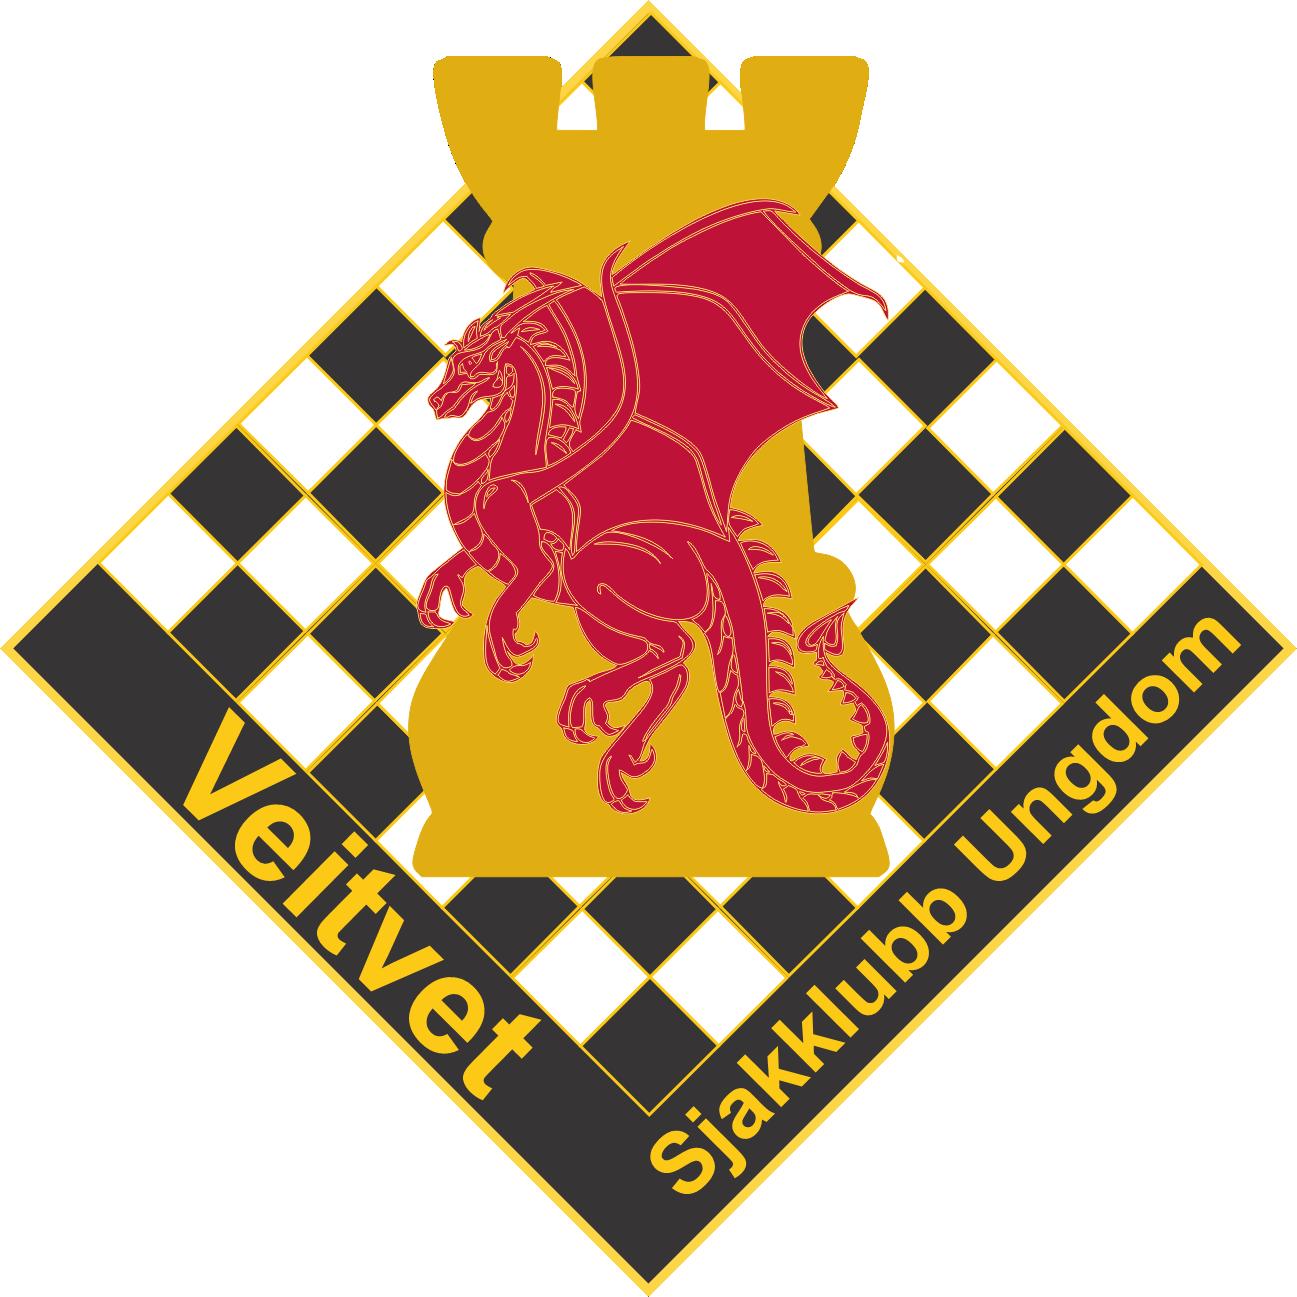 Veitvet Sjakklubb Ungdom